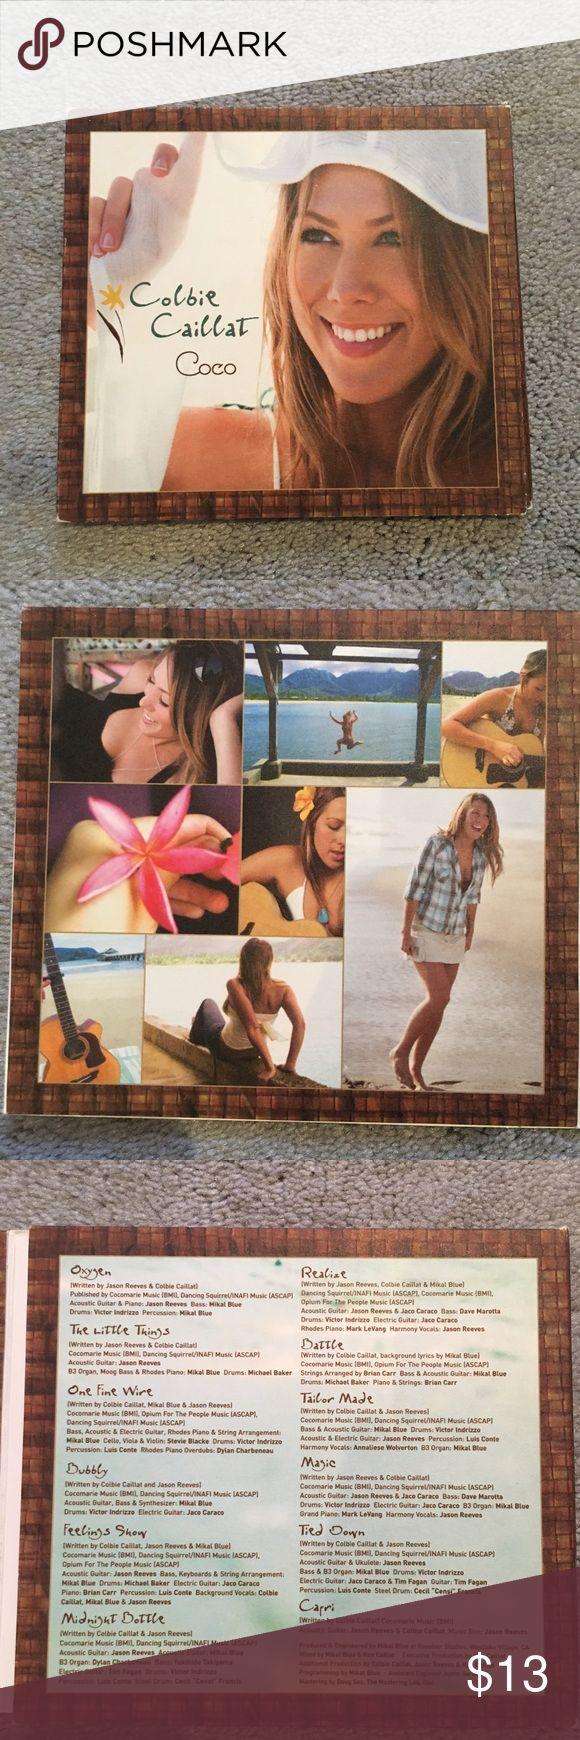 Colbie Caillat Coco CD Album A amazing classic CD Album from Colbie Caillat many years ago. Target Accessories